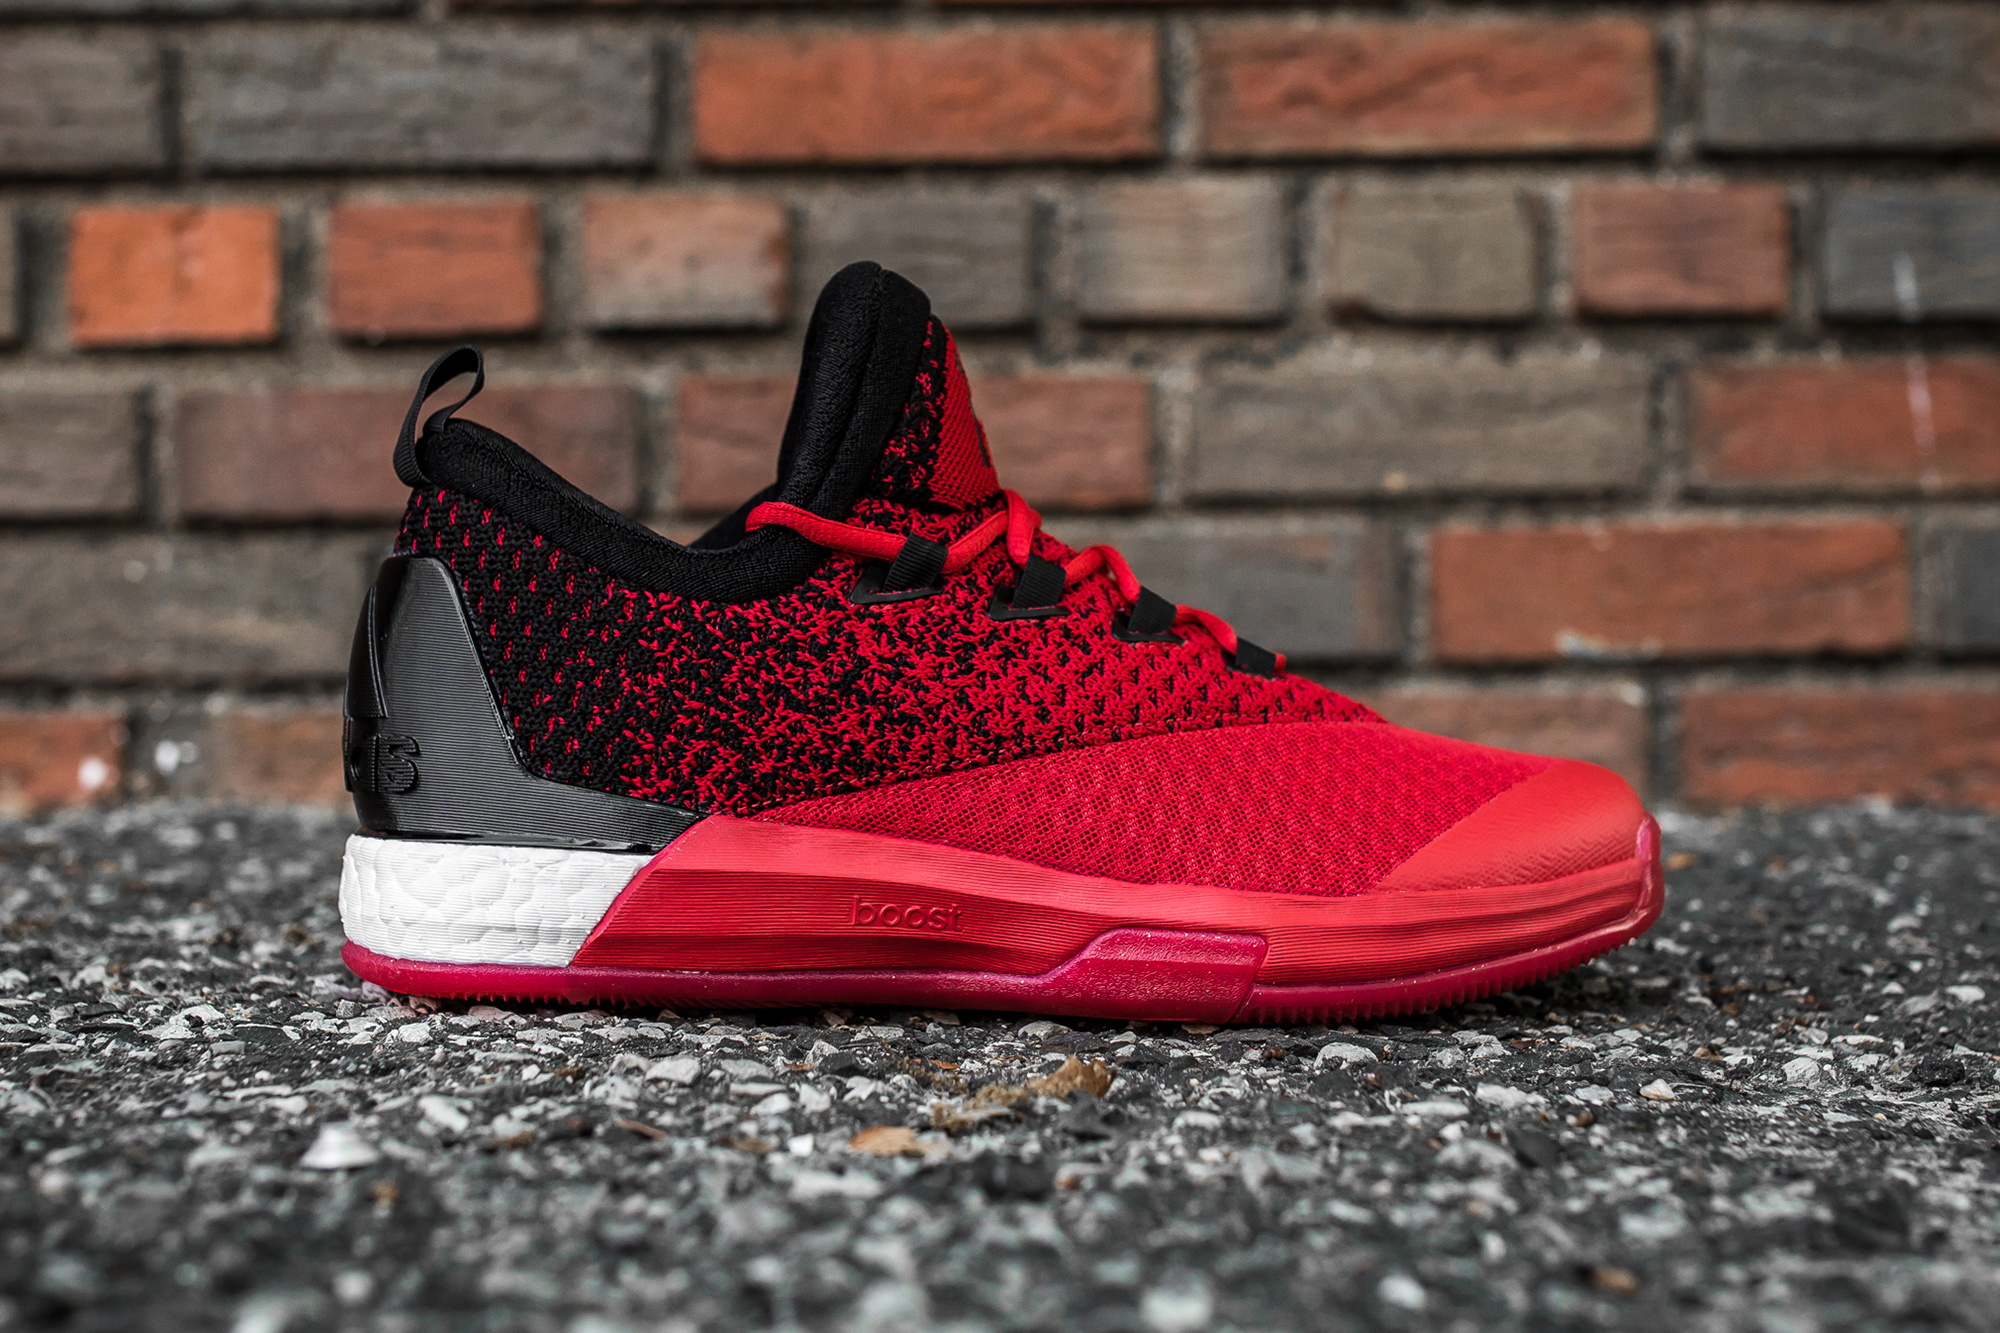 c66adb8b61c hot adidas crazylight boost 2.5 low red black side 188e5 0bbc9